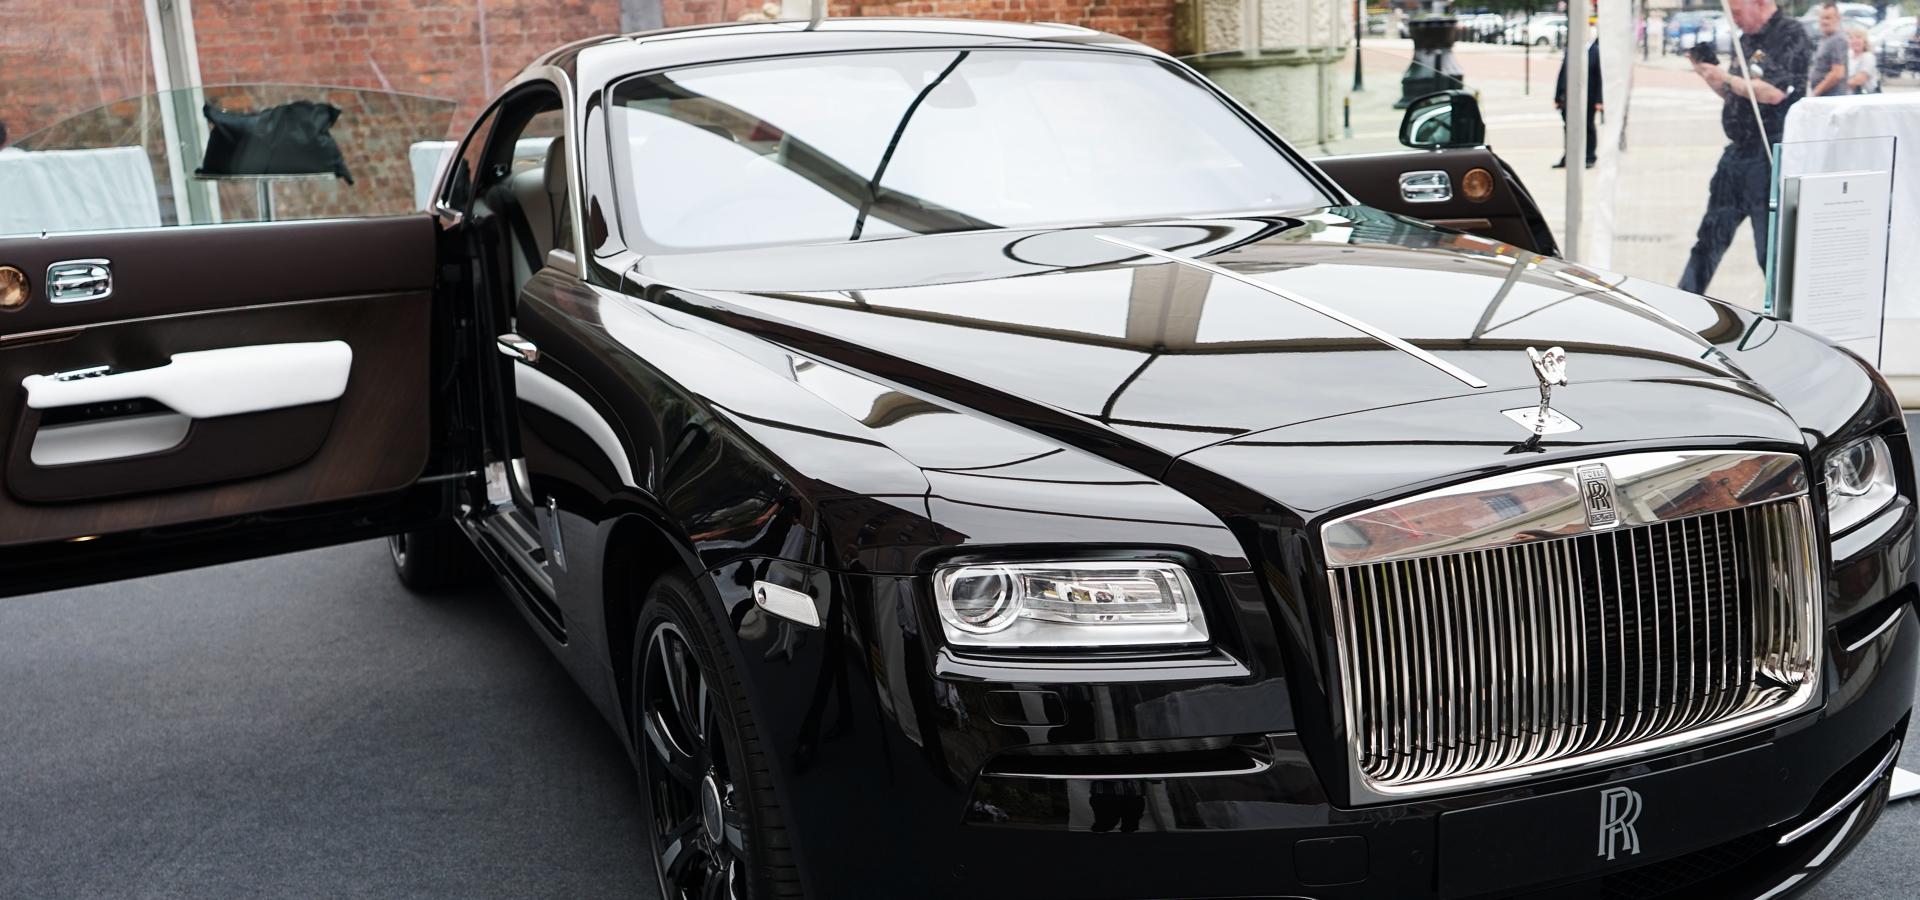 Drive My Car: the George Martin Rolls-Royce